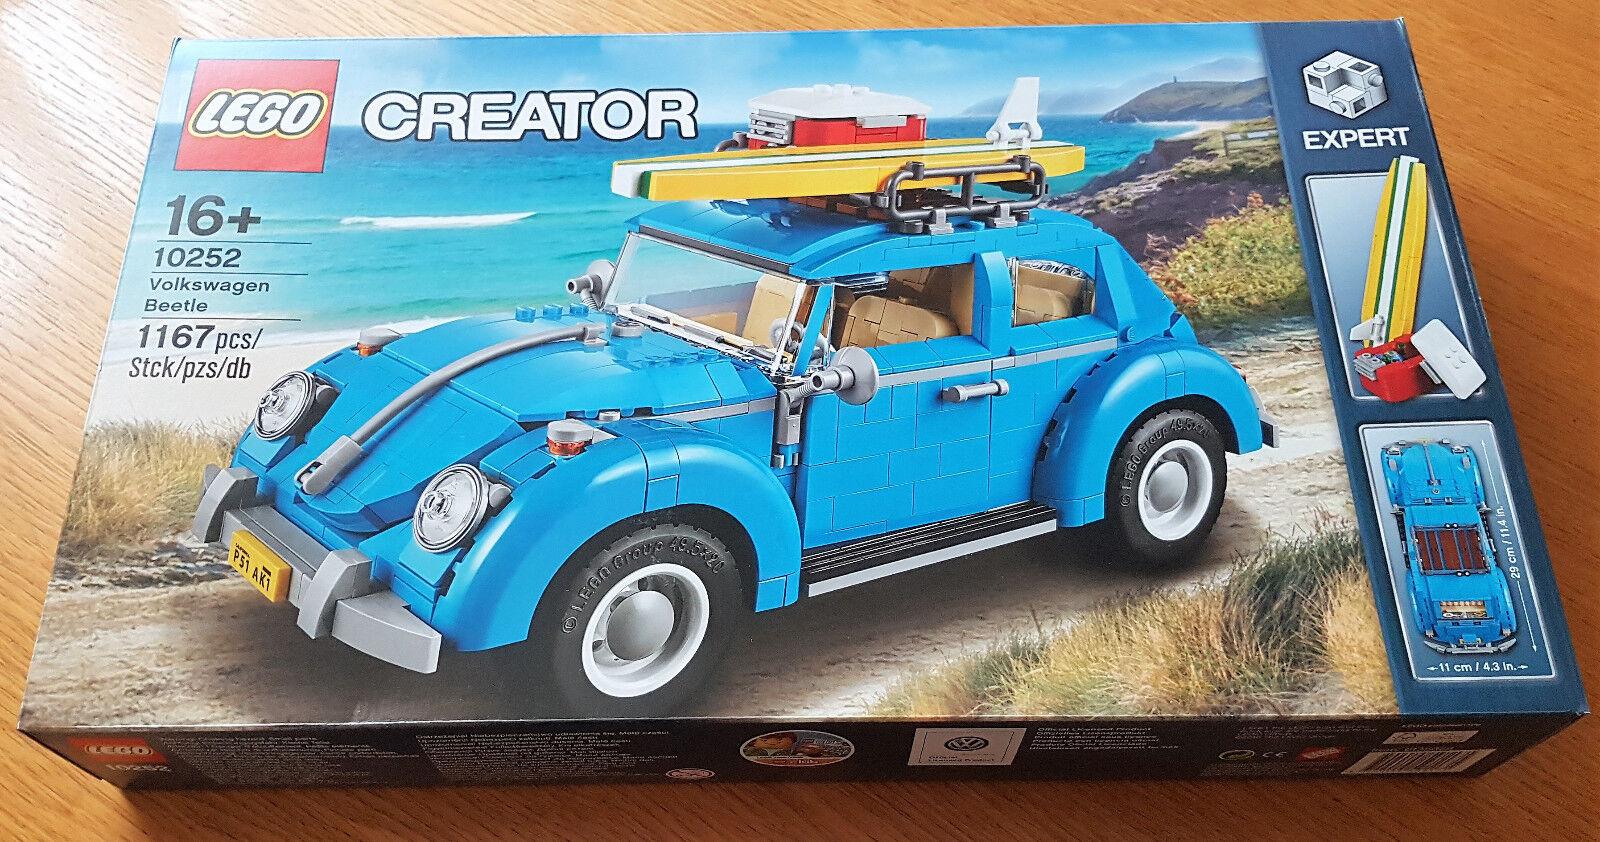 LEGO Creator 10252 VW Beetle nouveau  neuf dans sa boîte